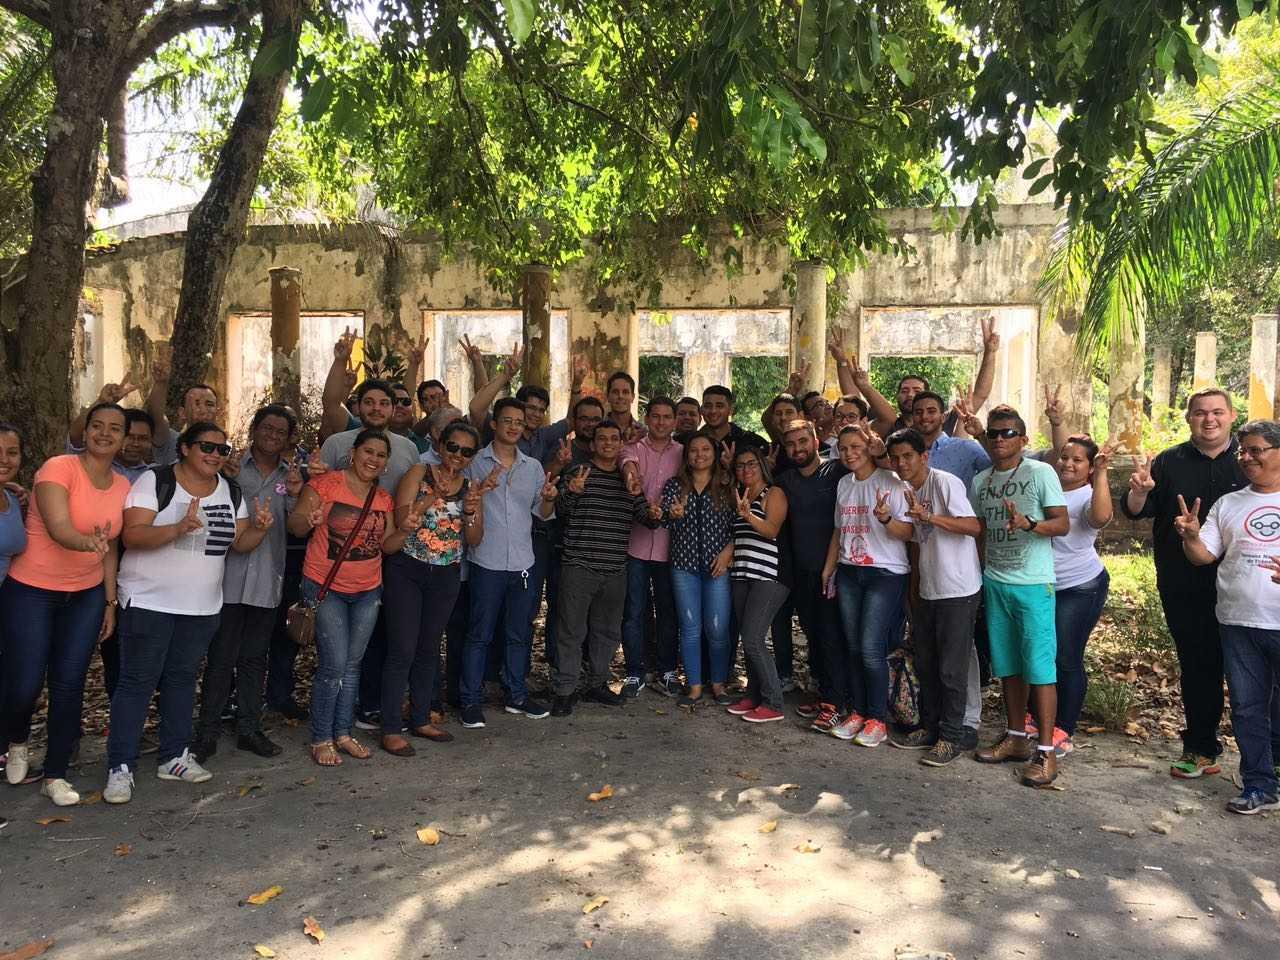 marcelo-ramos-vai-construir-parques-da-juventude-com-centros-culturais